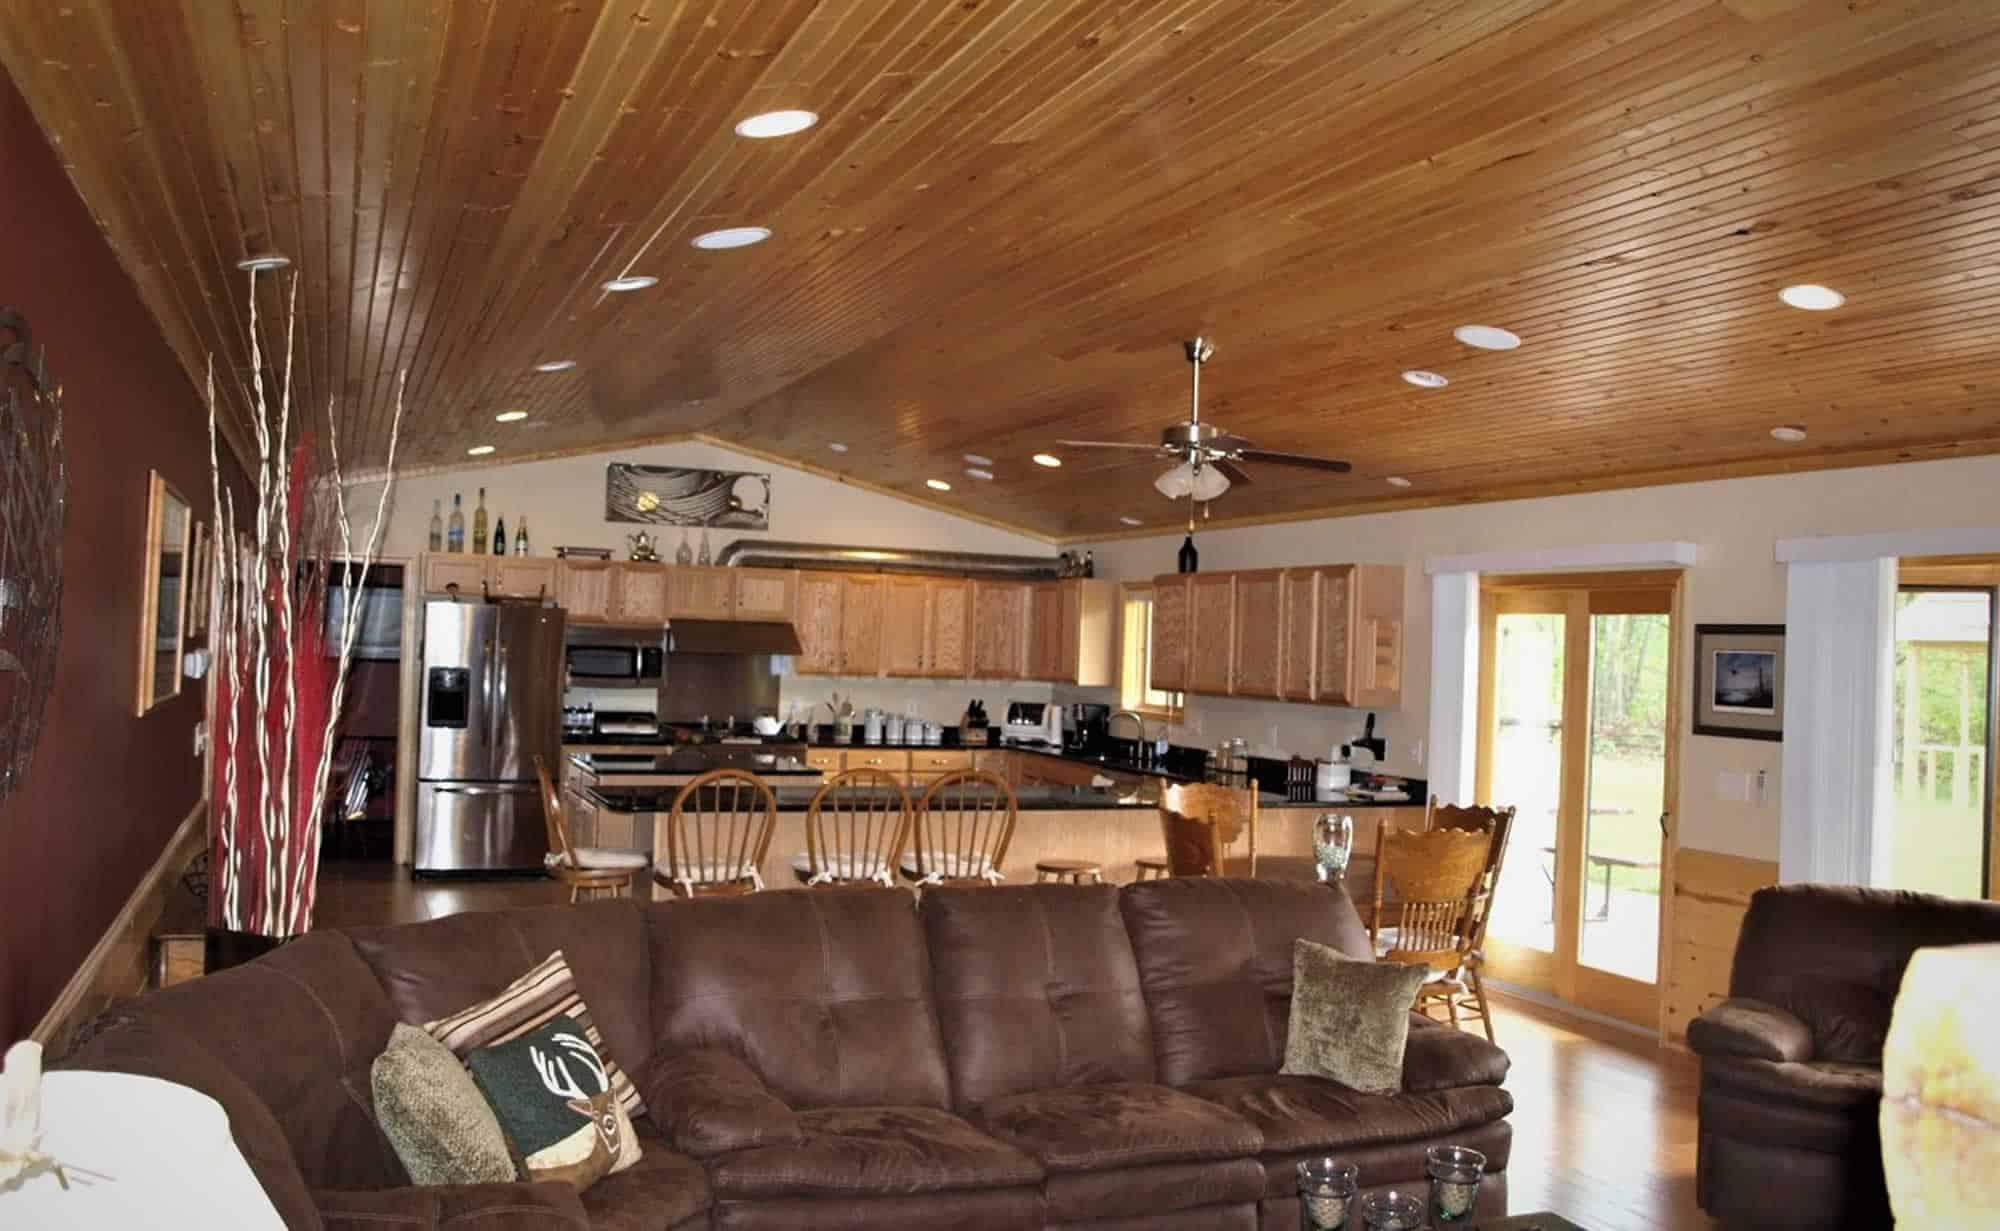 Interior Pole Barn Home